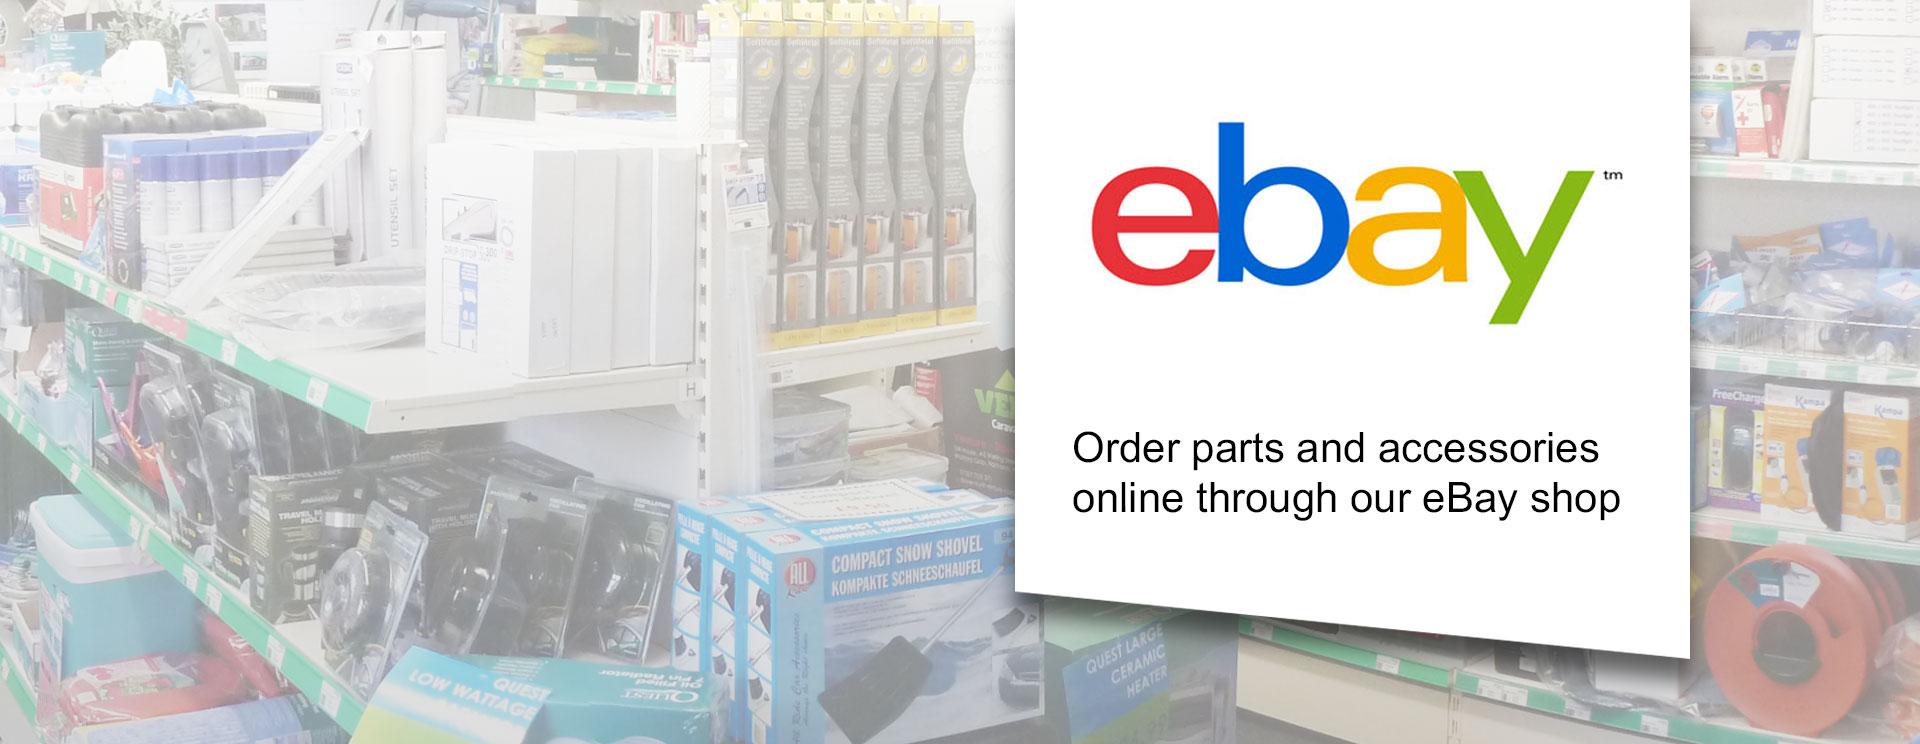 eBay shop online